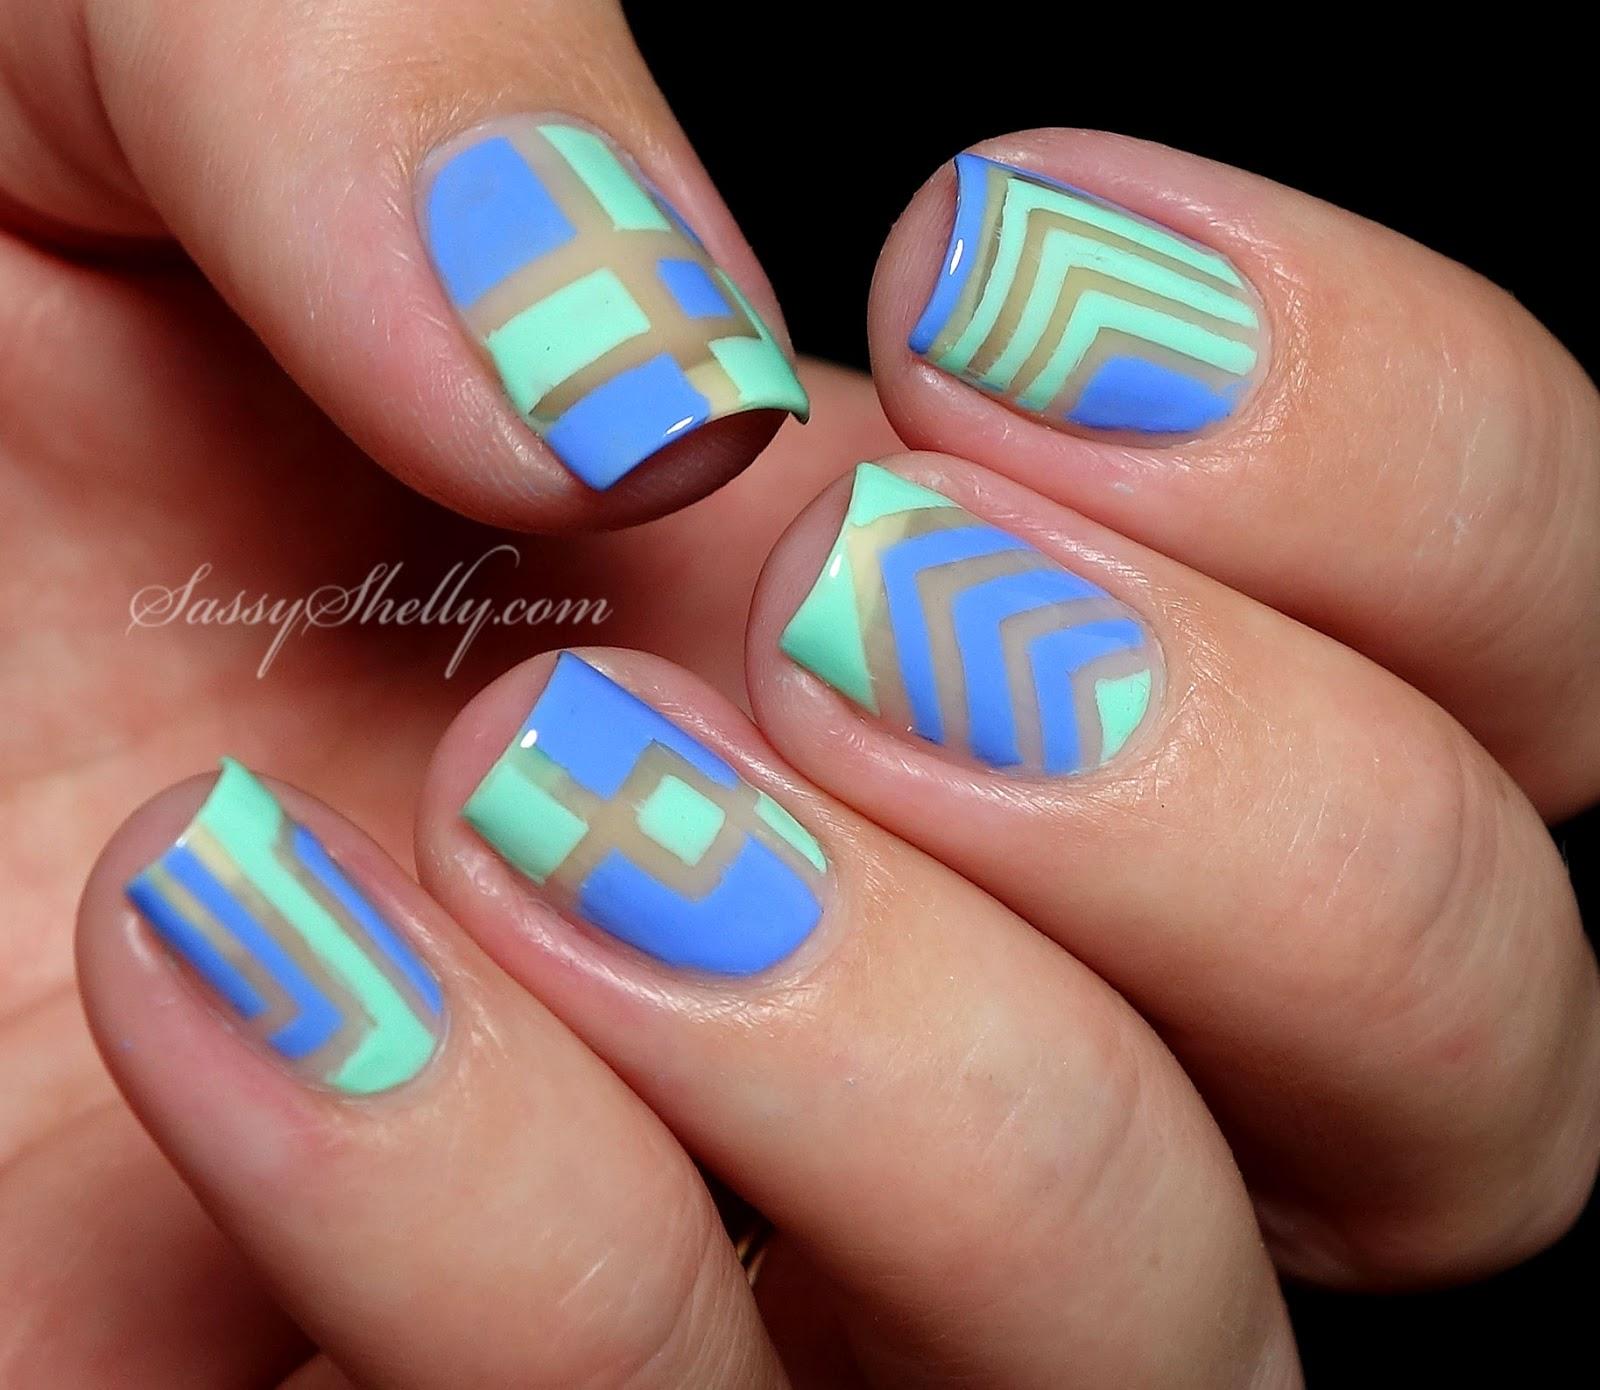 picture-polish-nail-art-right-angle-vinyls-chevrons-squares-negative-space-manicure-for-blog-fest-2014